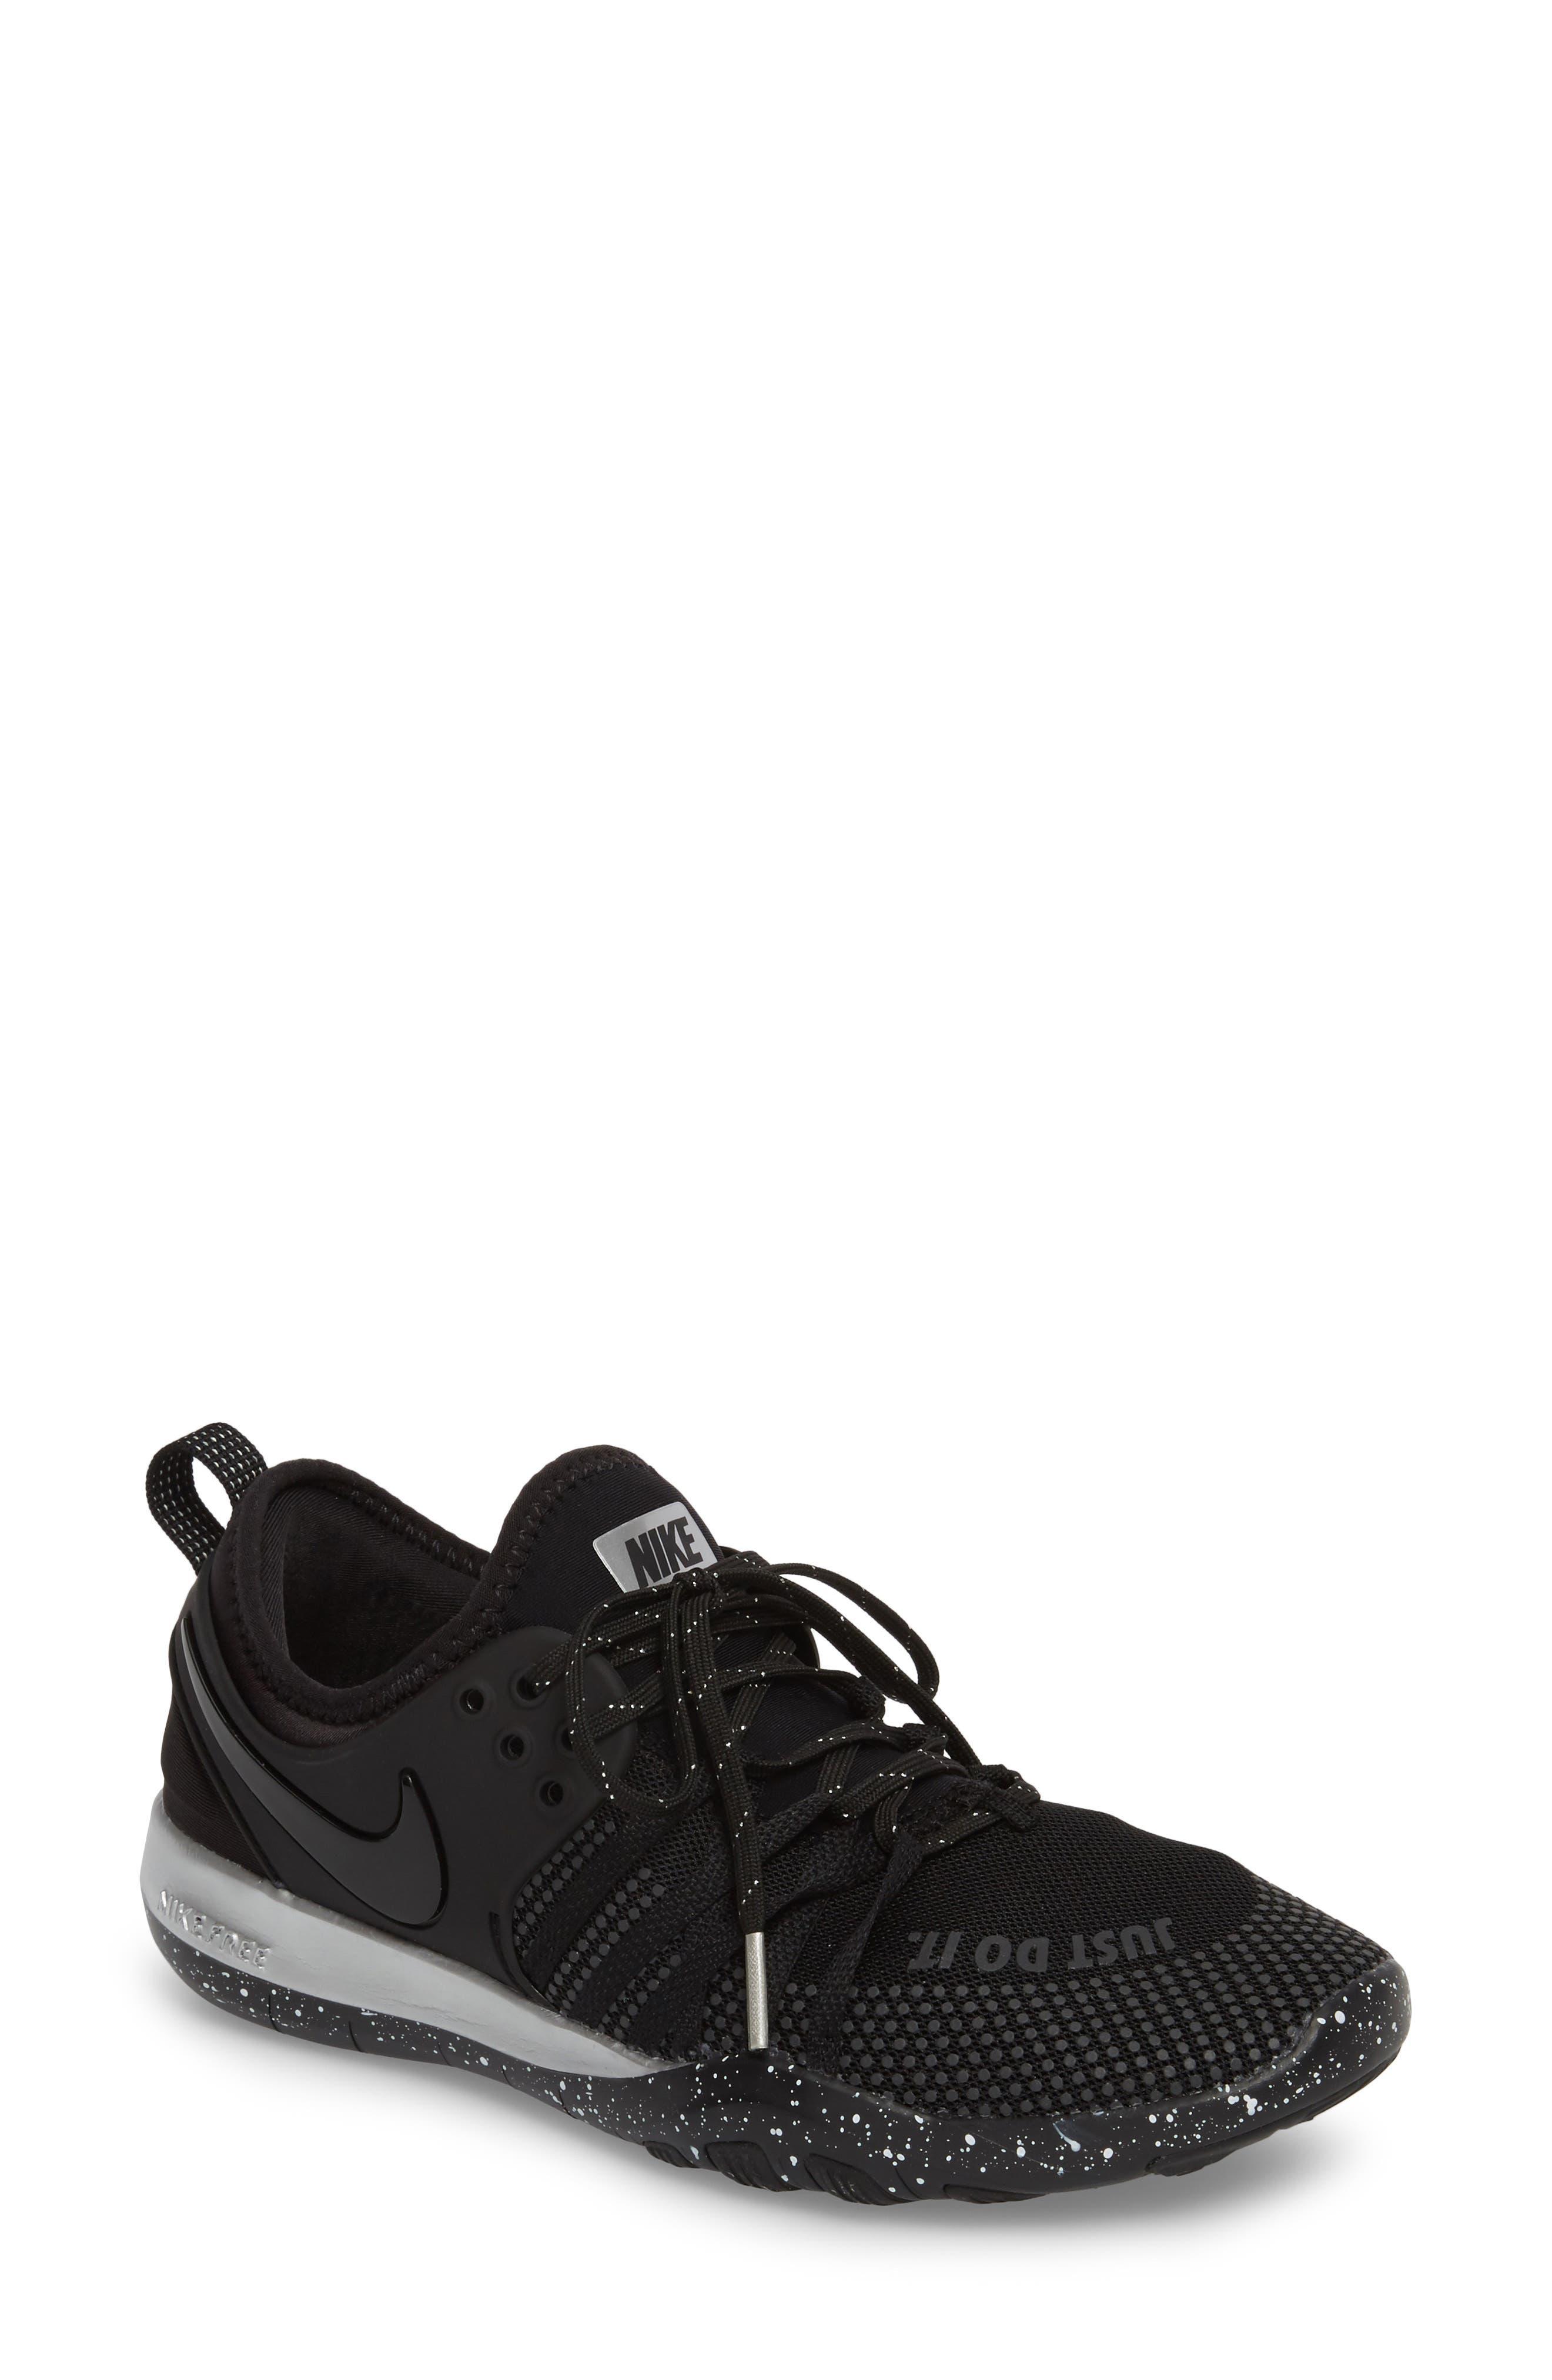 Nike Free TR 7 Selfie Training Shoe